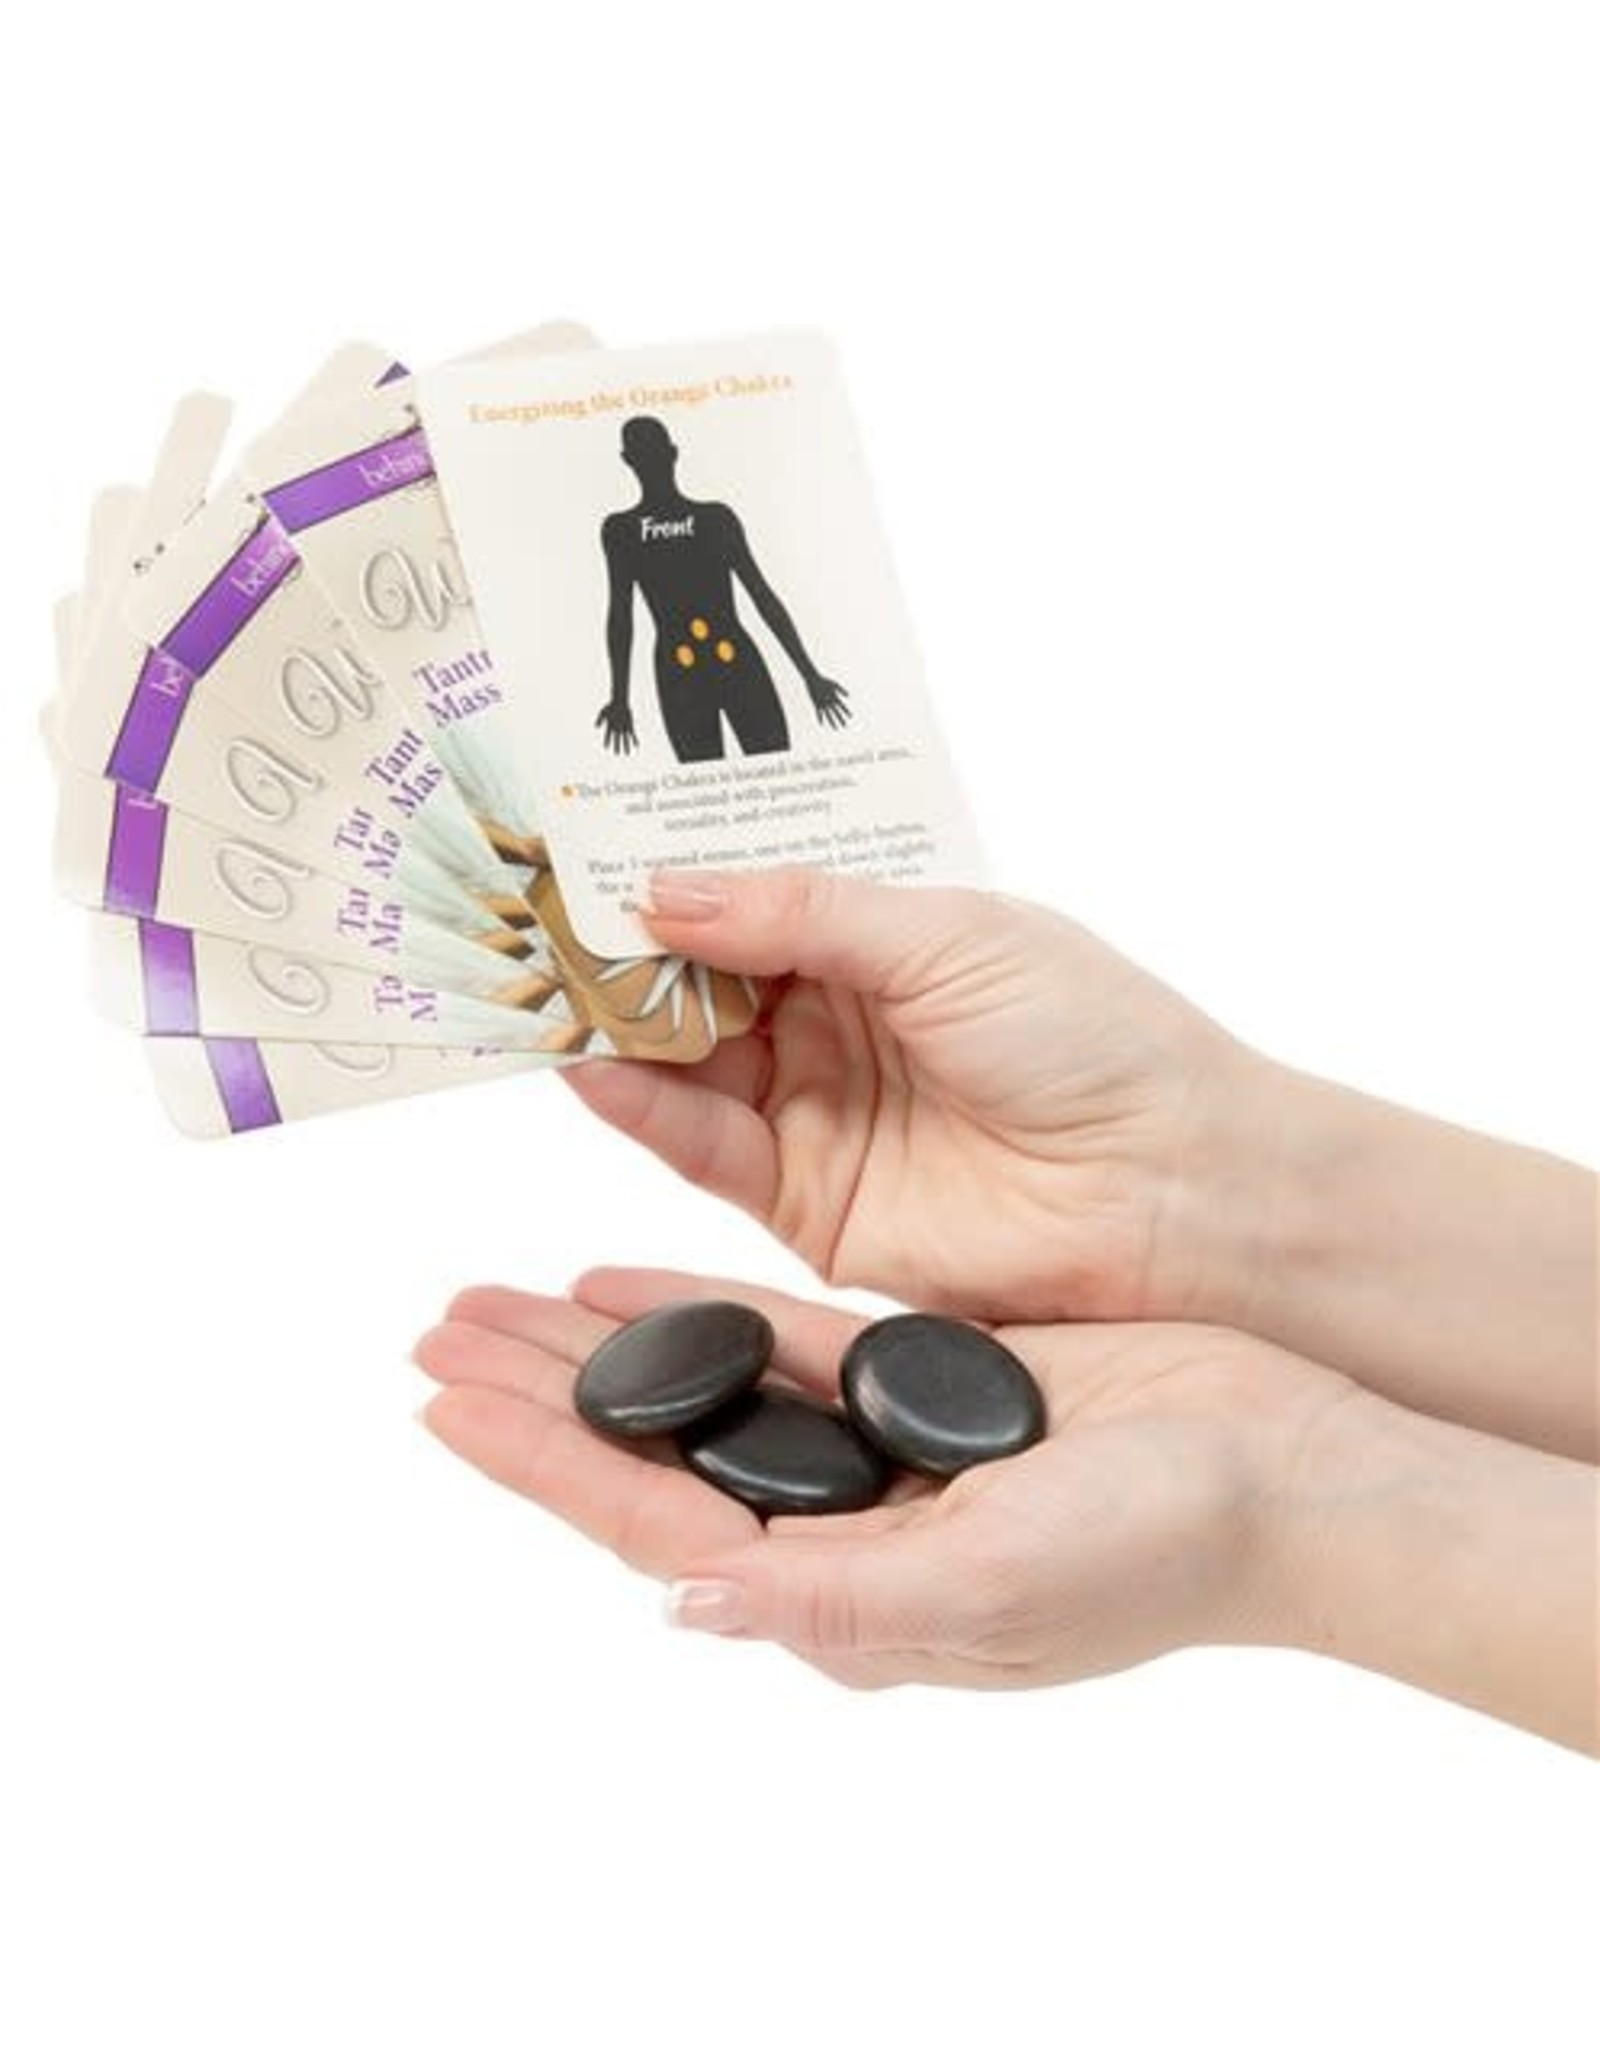 Little Genie Weekend in Bed - Tantric Massage Activity Kit